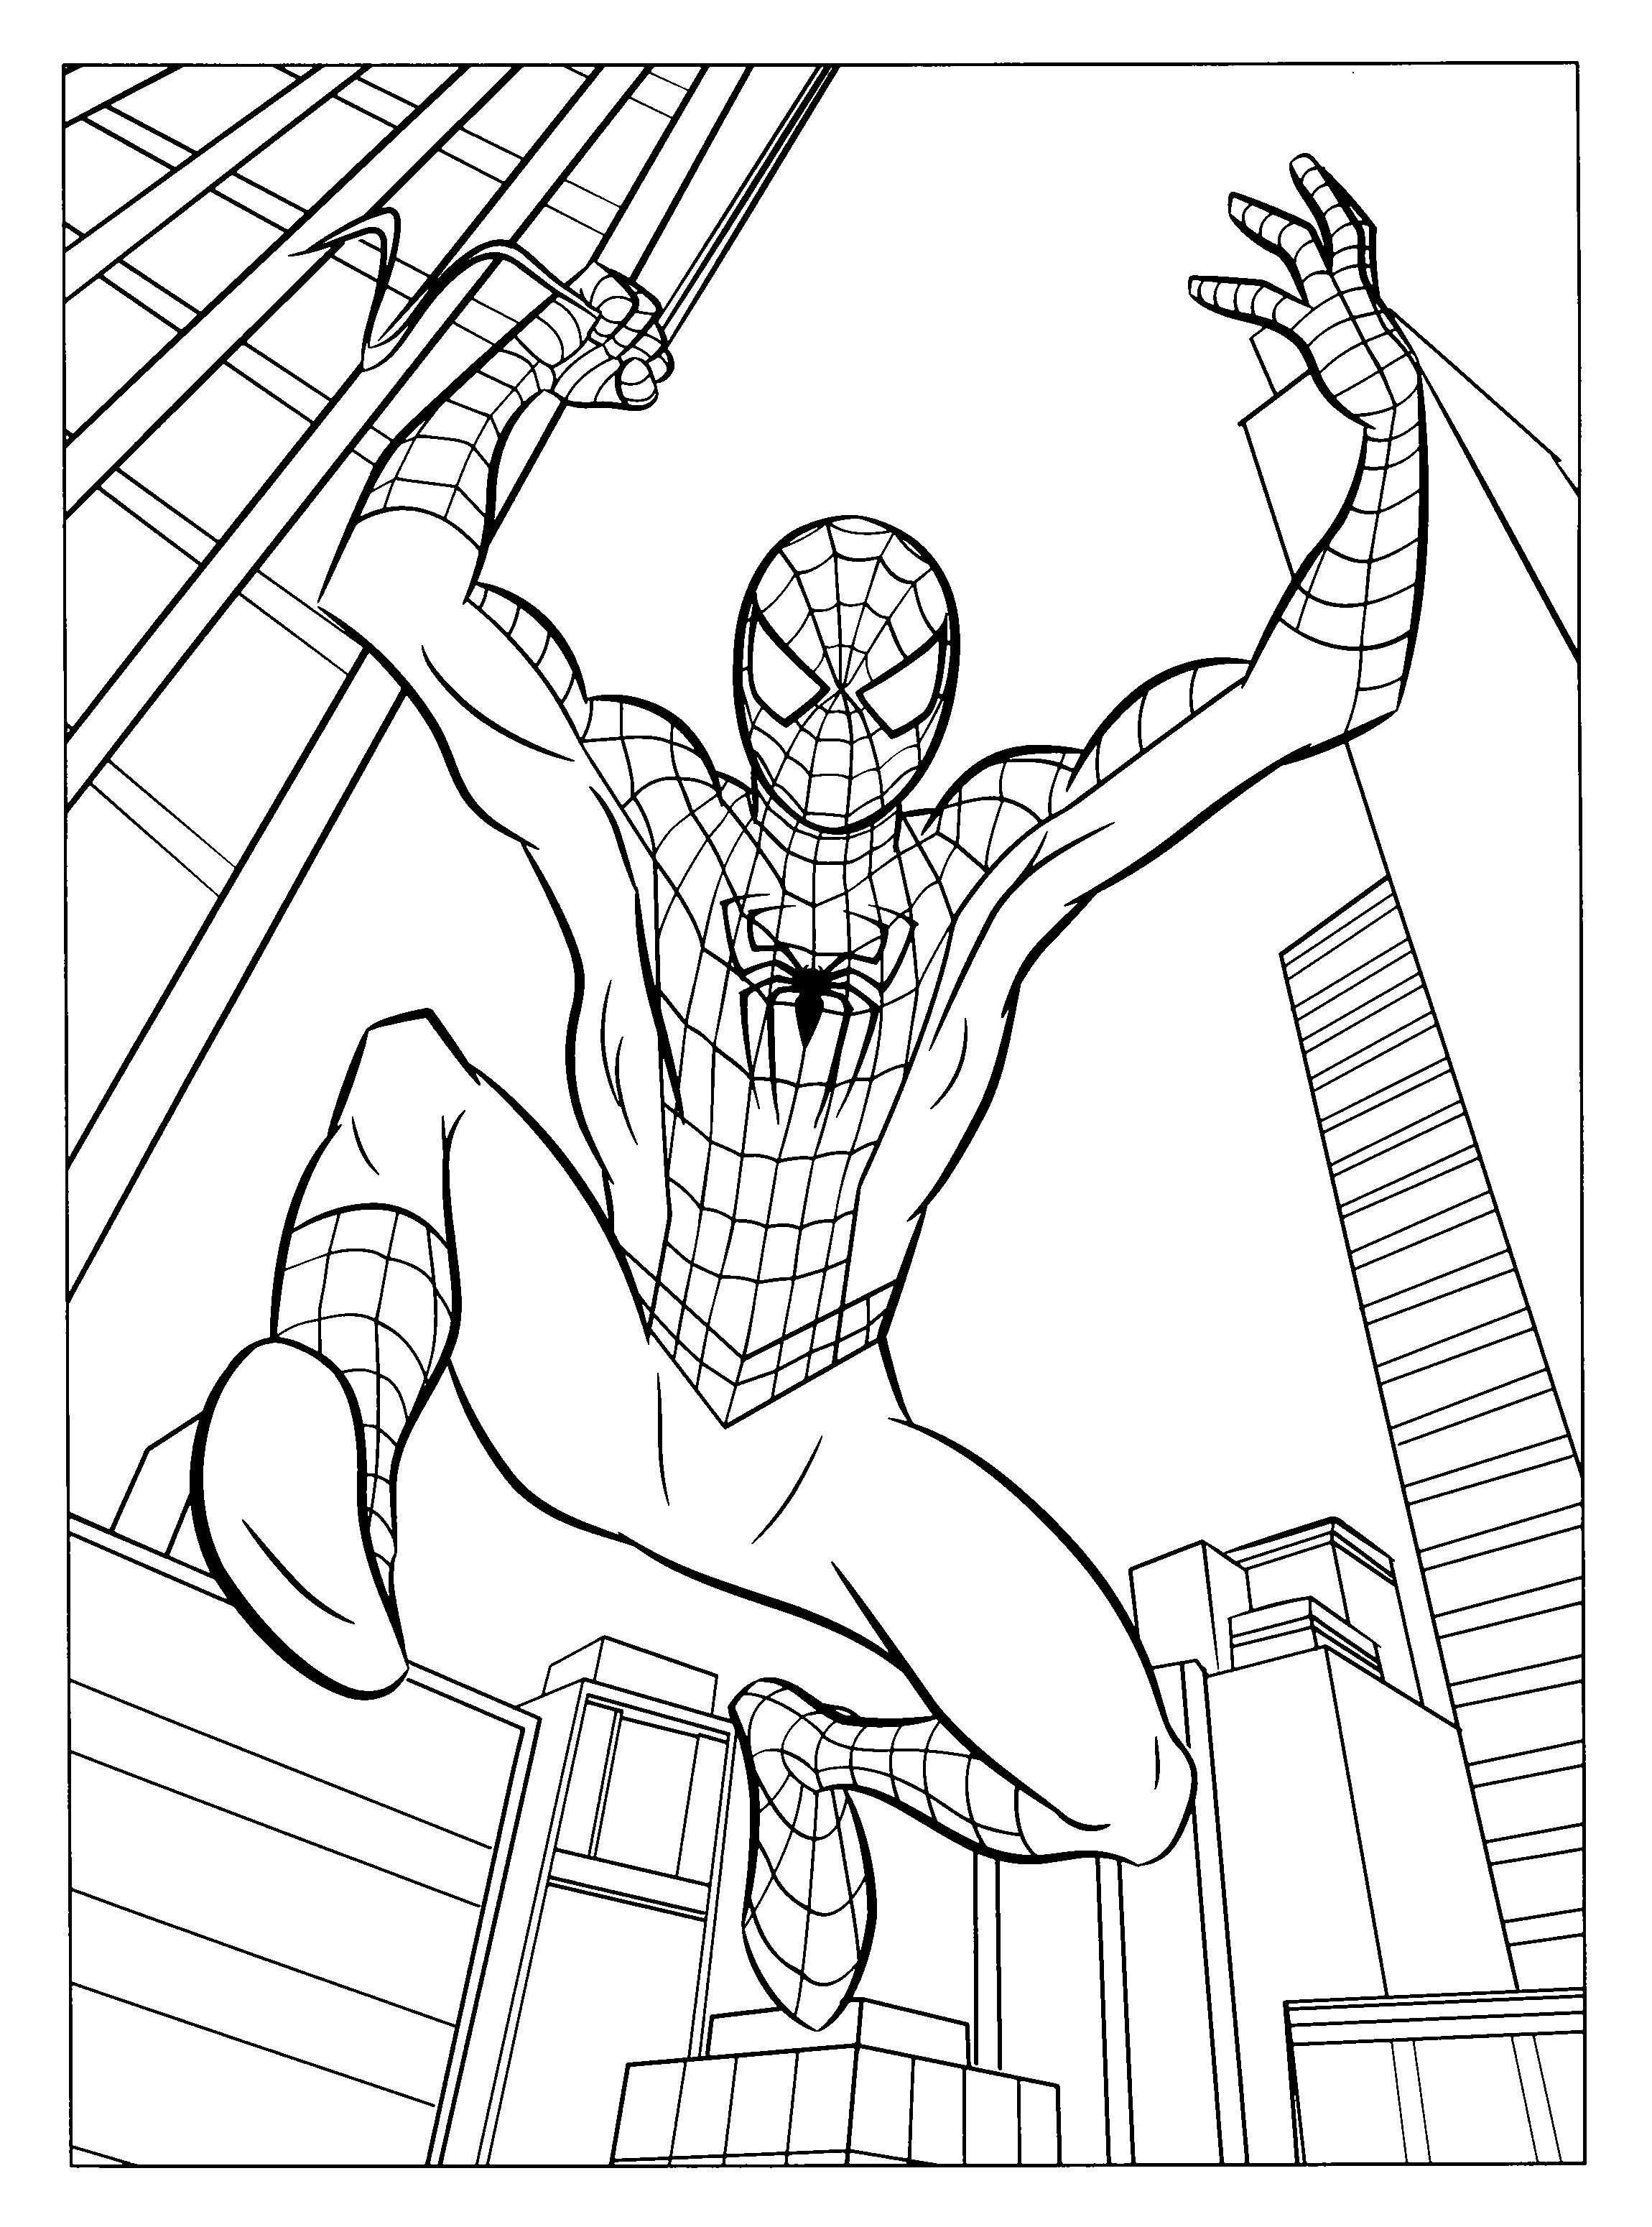 Free Printable Spiderman Coloring Pages For Kids Kleurplaten